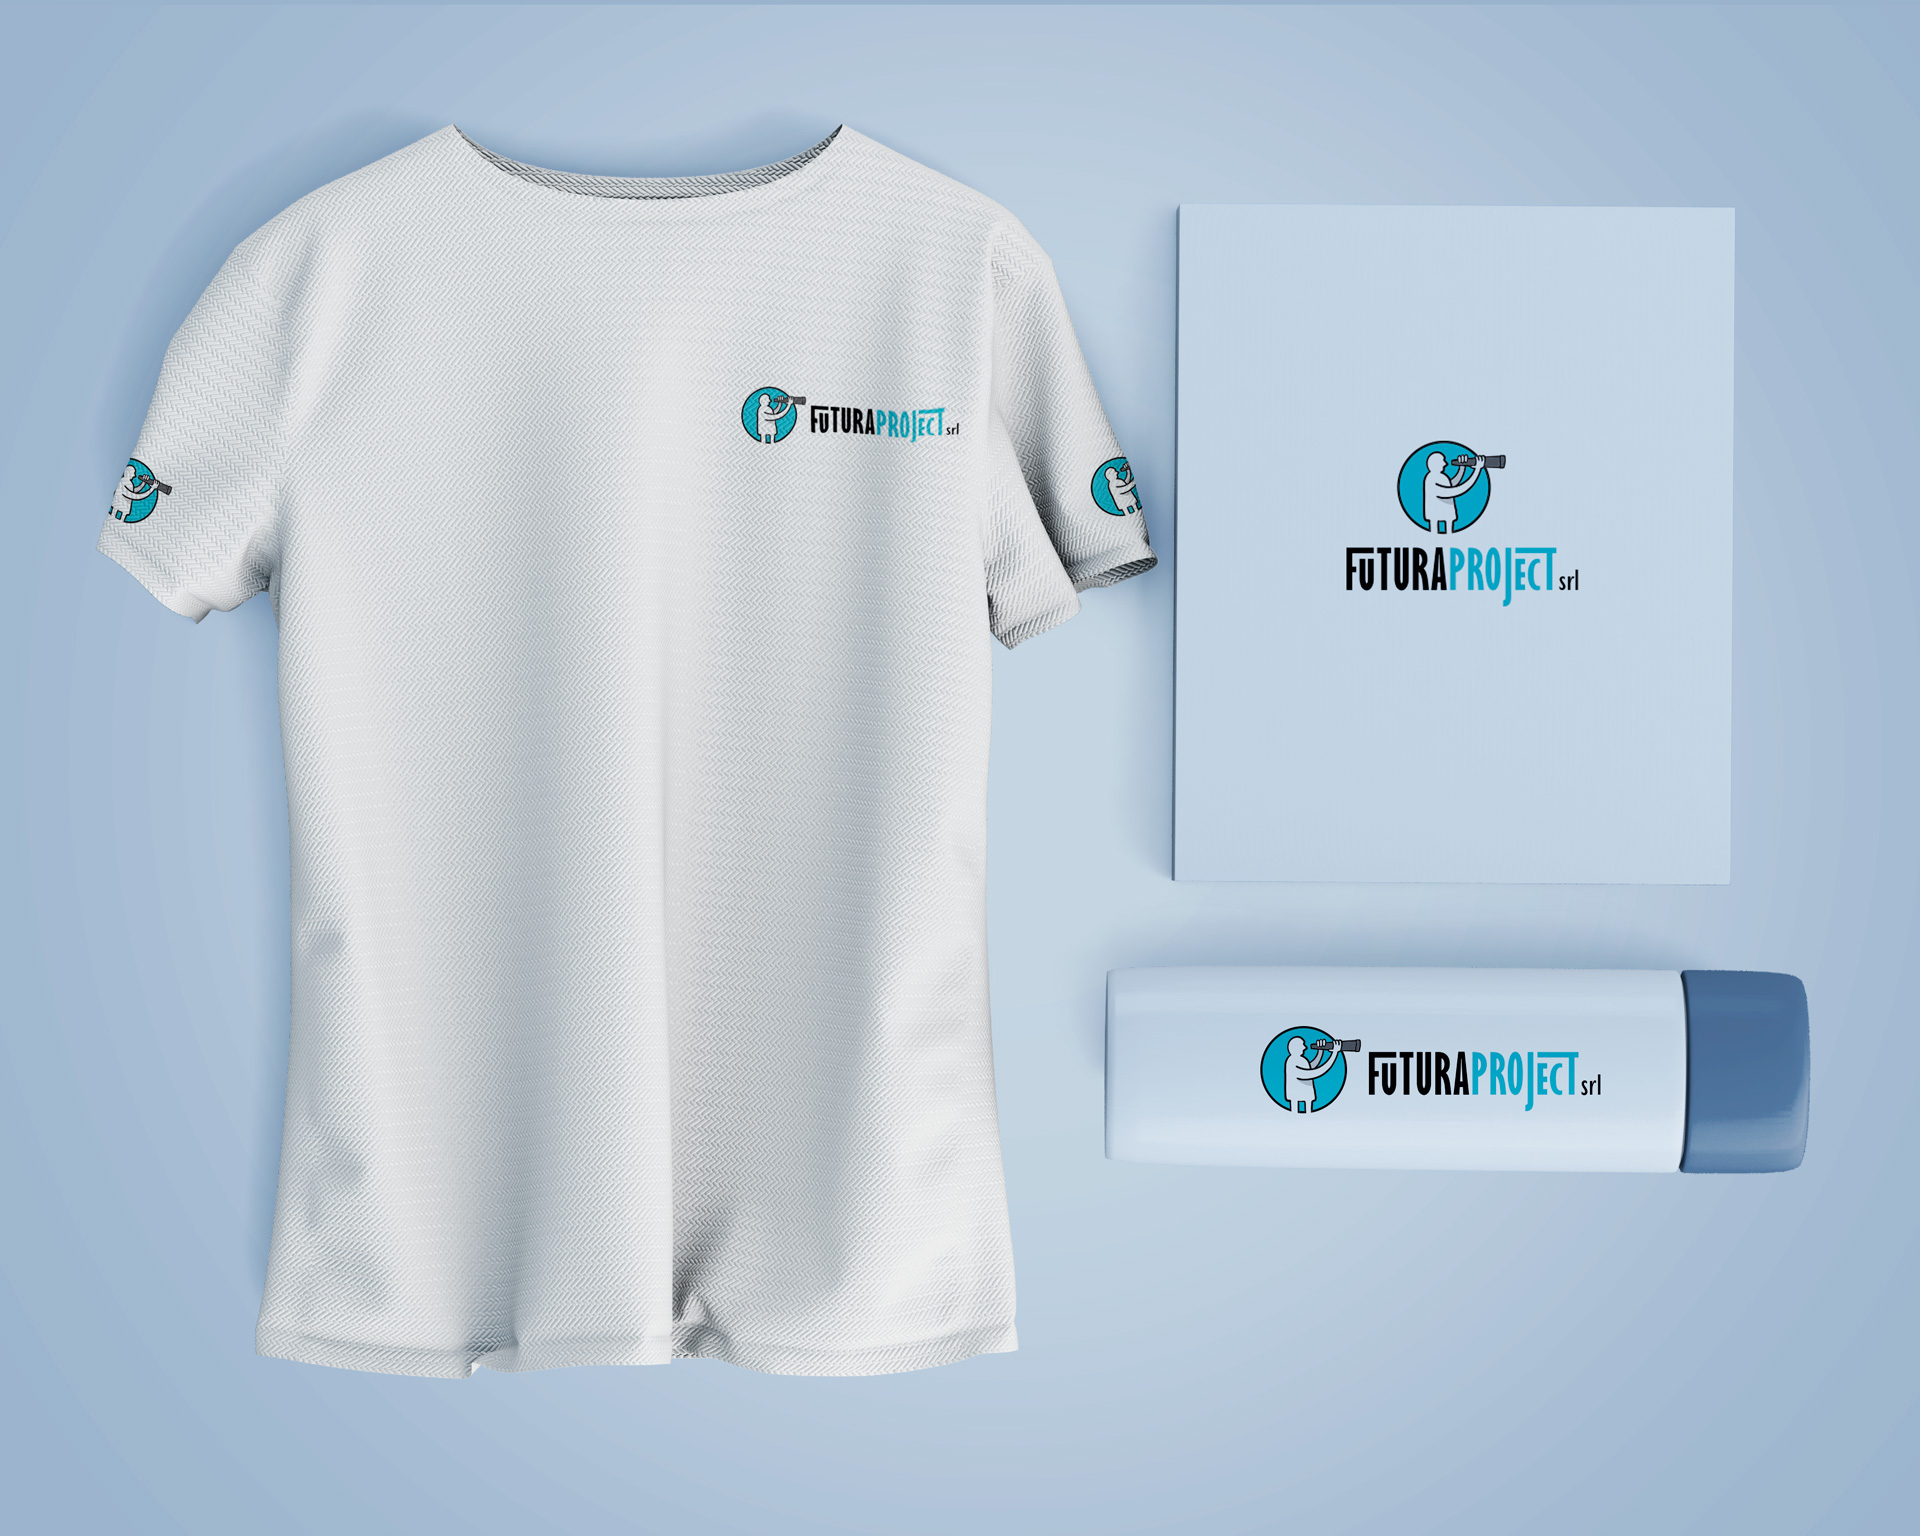 Corporate image Futura Project